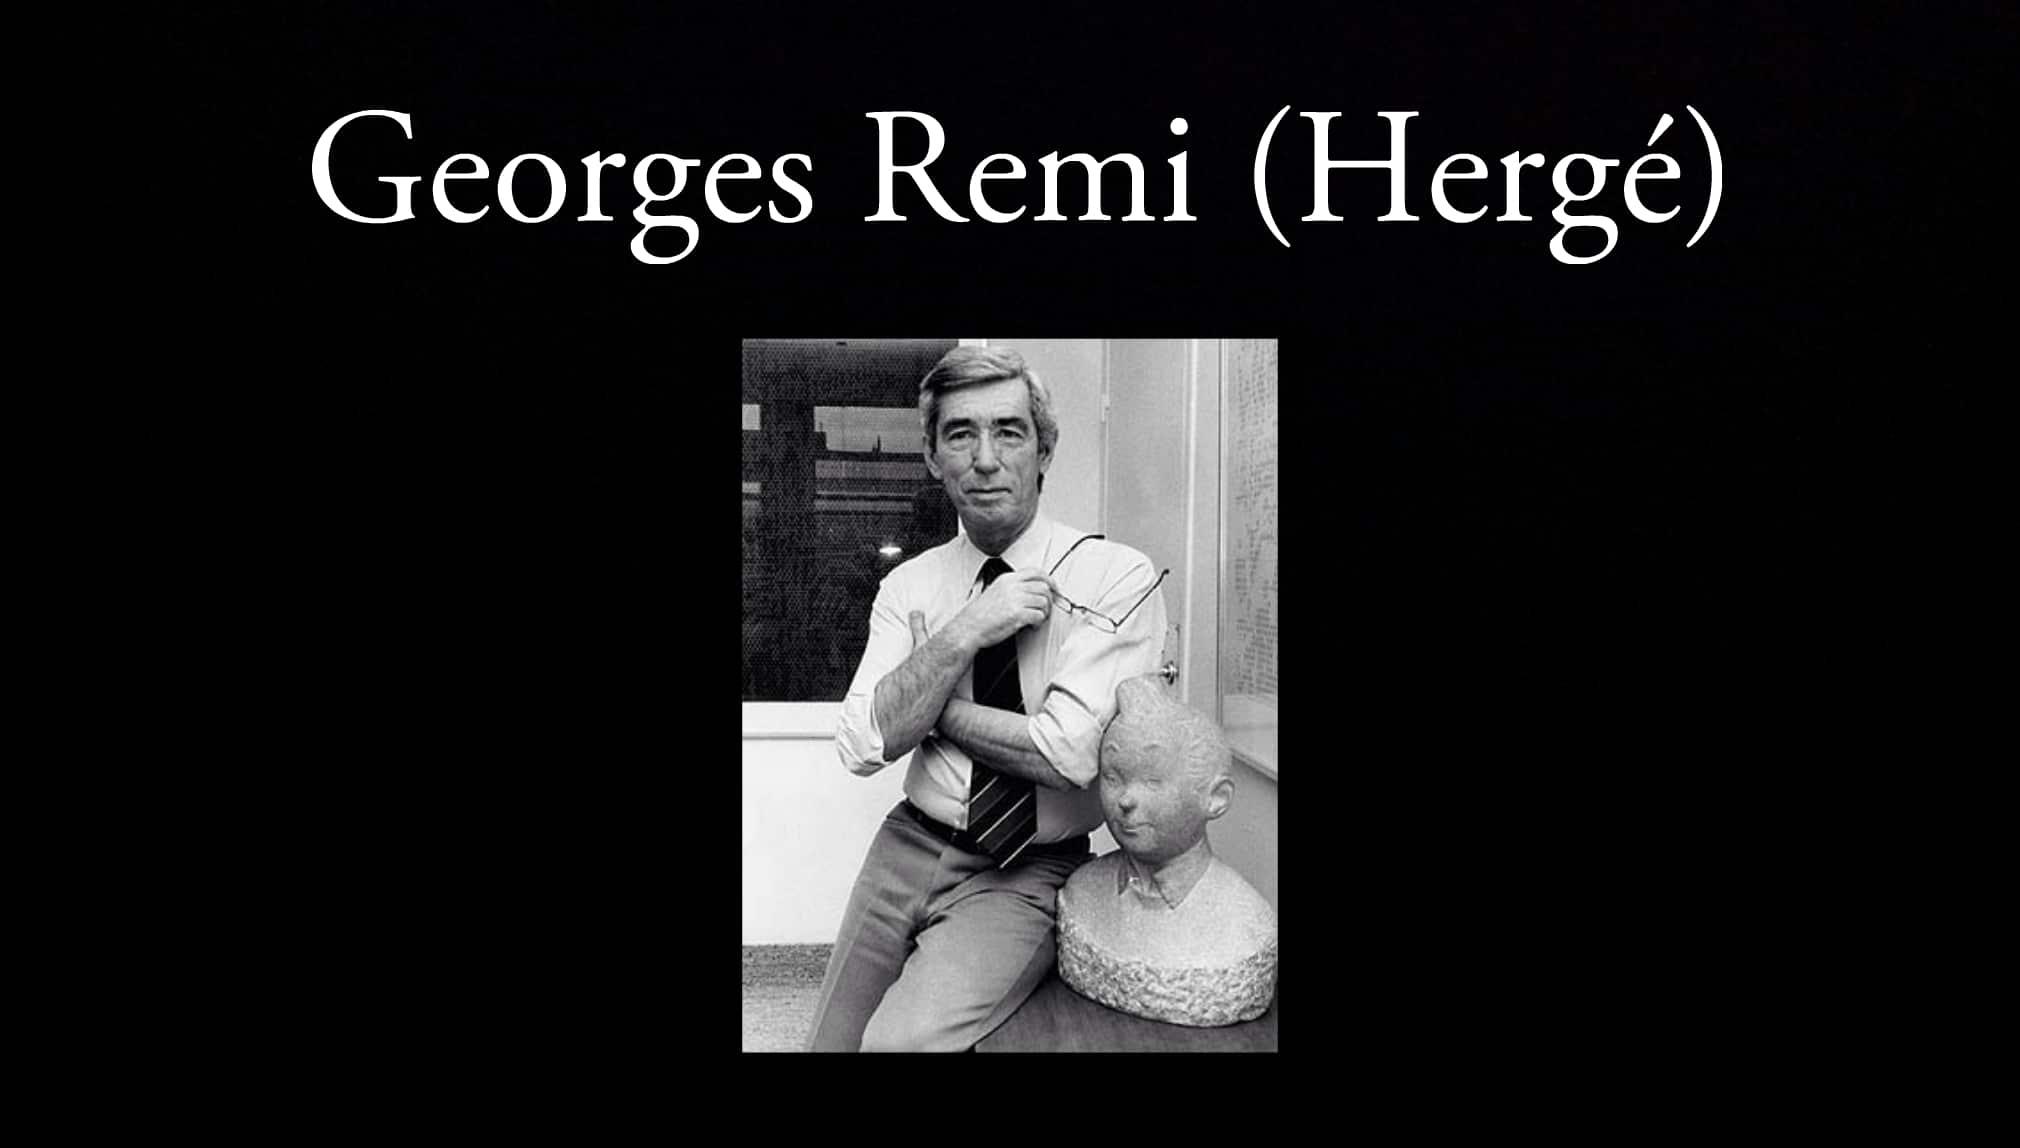 Georges Remi (Hergé).